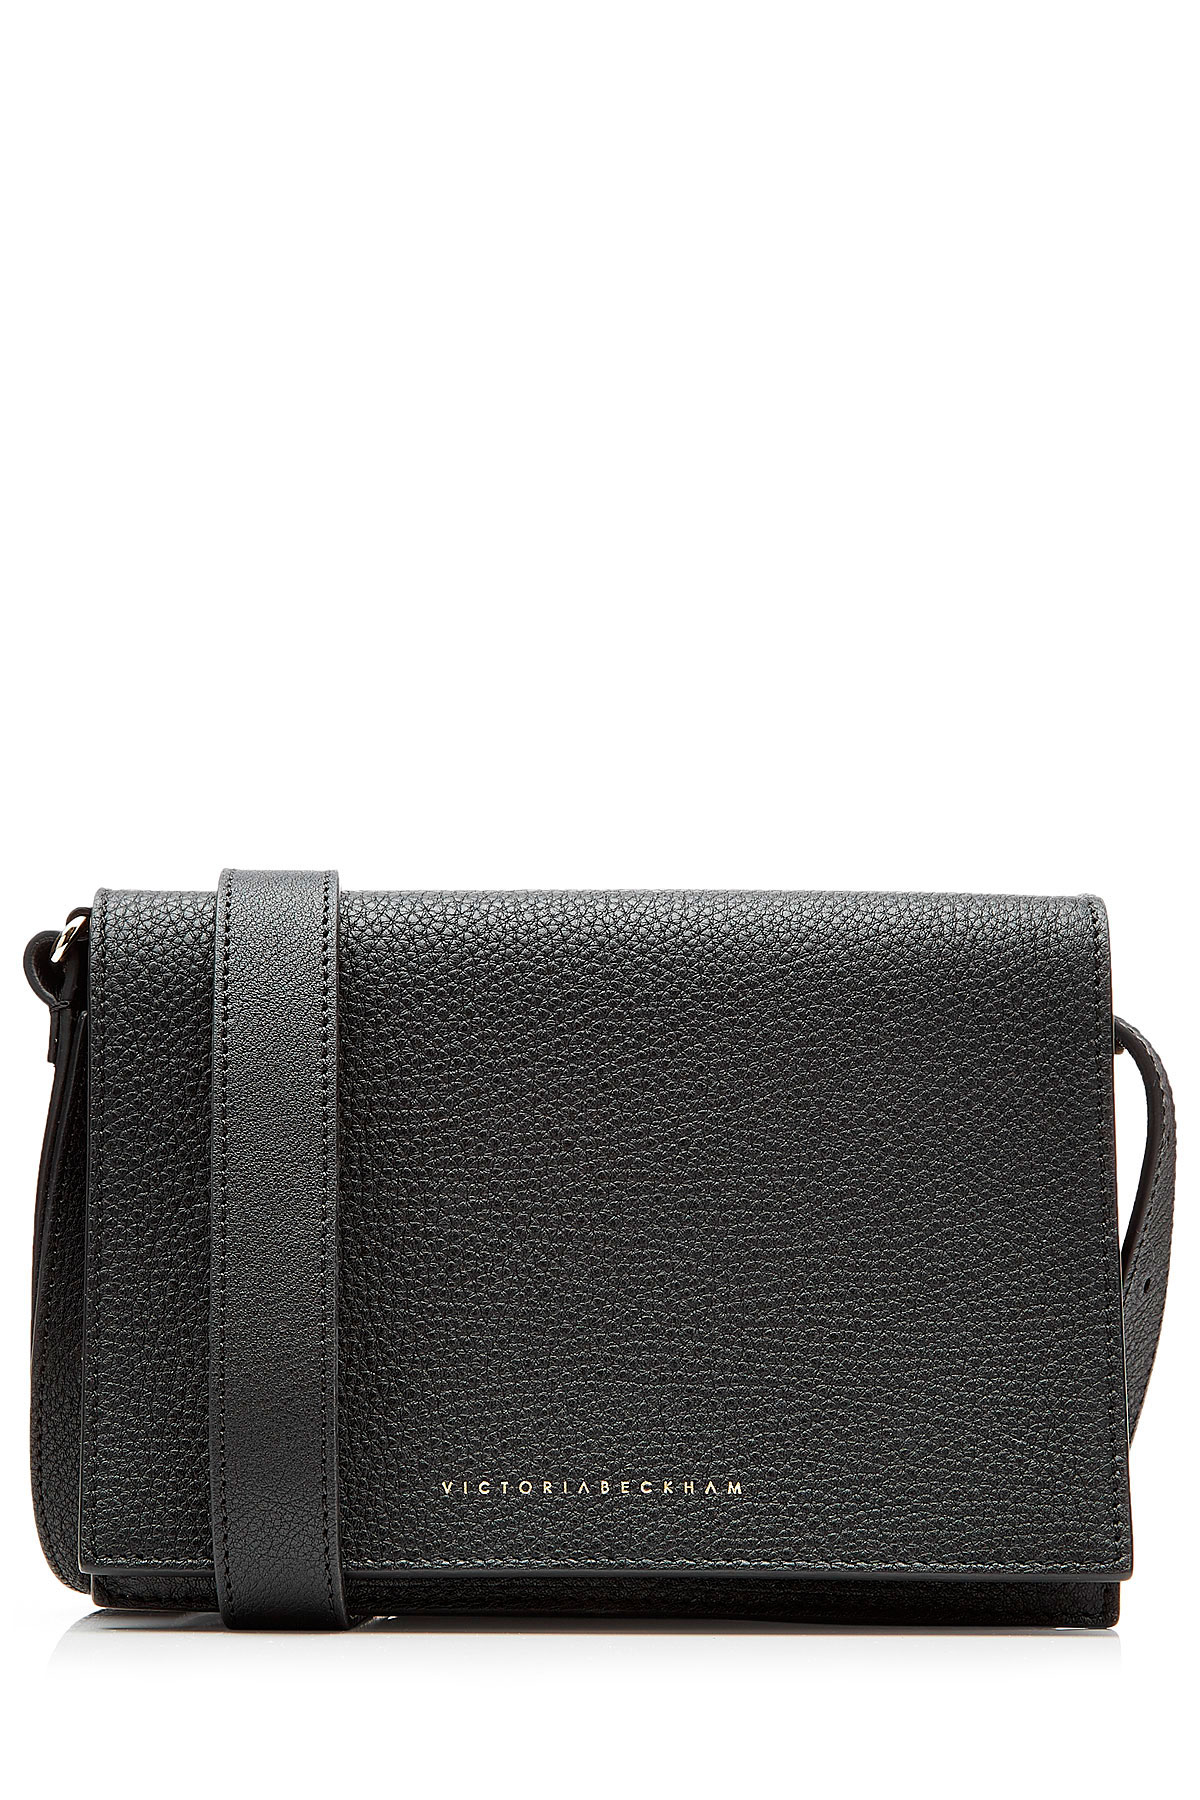 Victoria Beckham mini hobo bag - Black B8mOqC